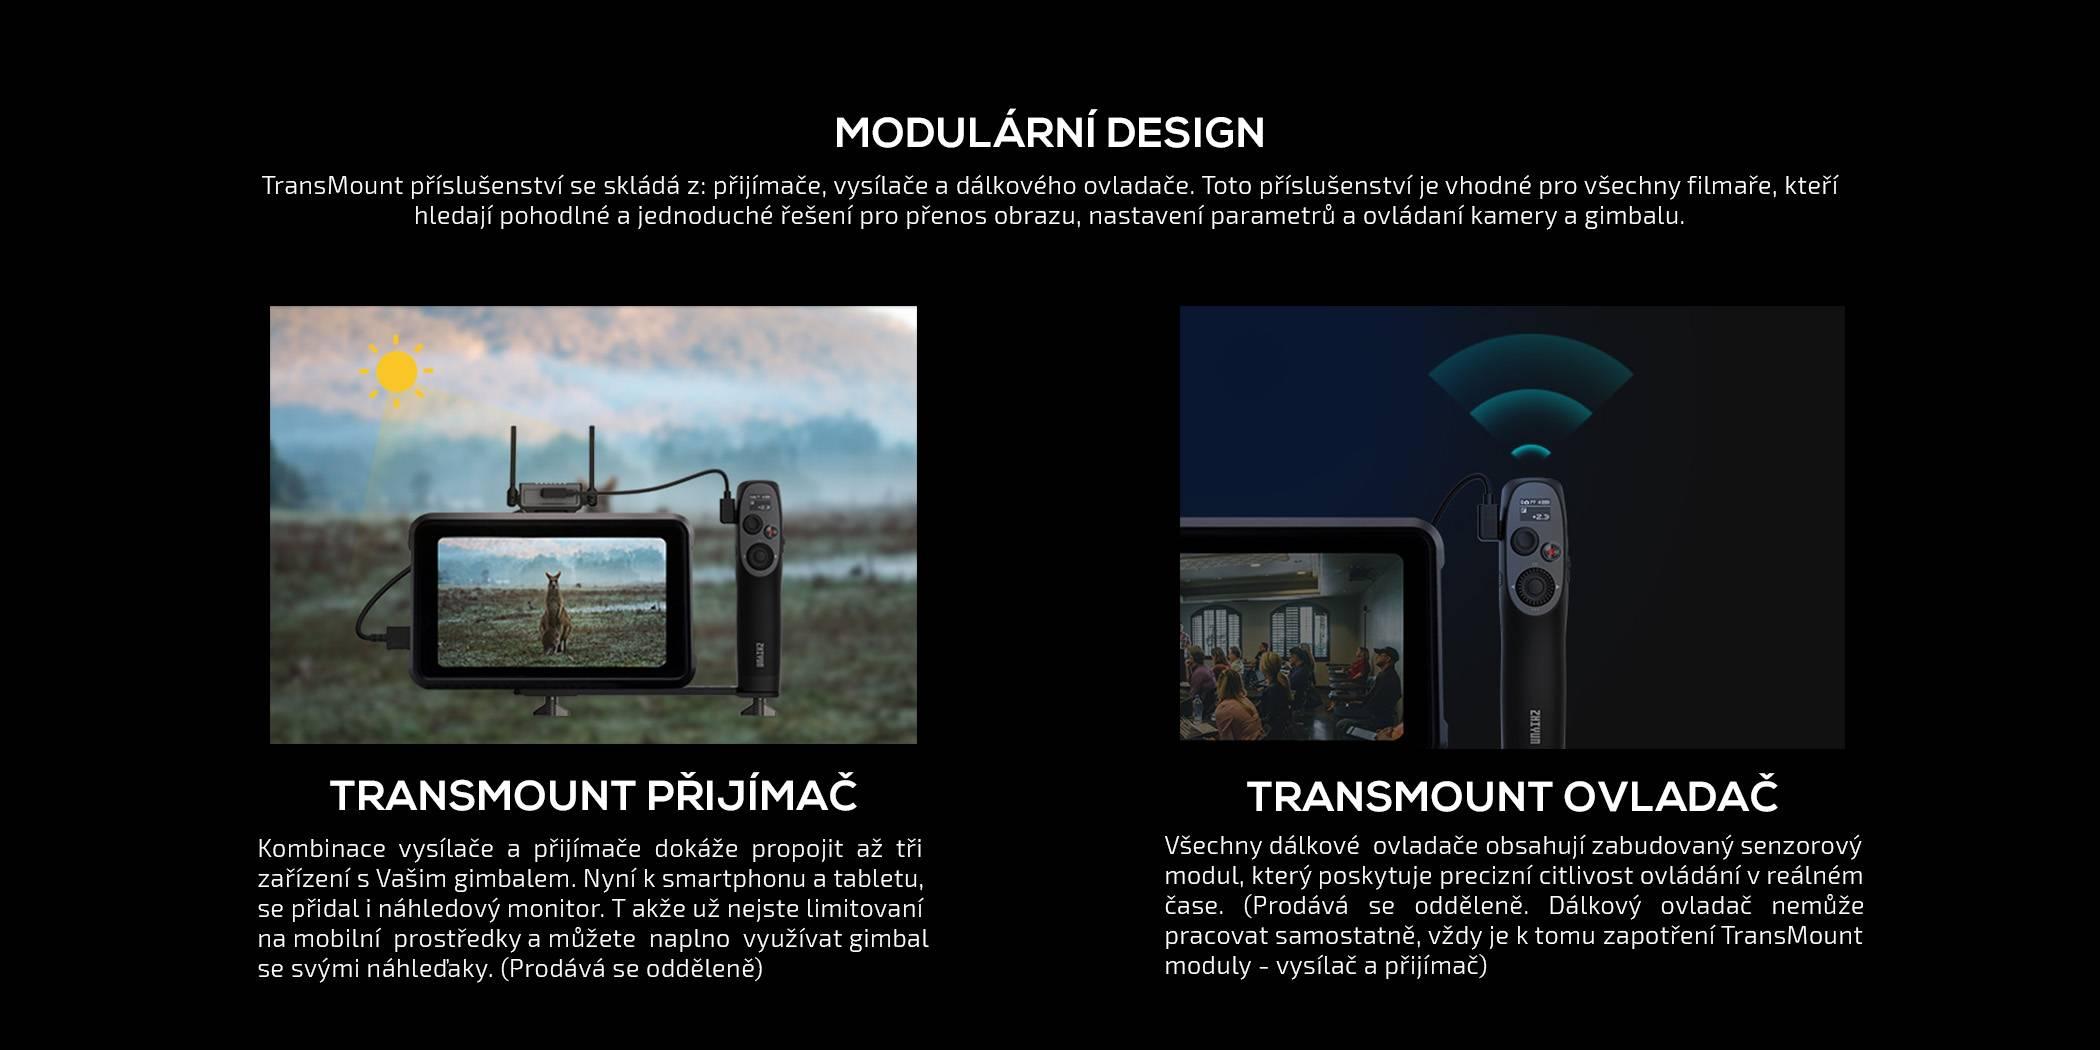 film-technika-zhiyun-weebill-s-modulární-design